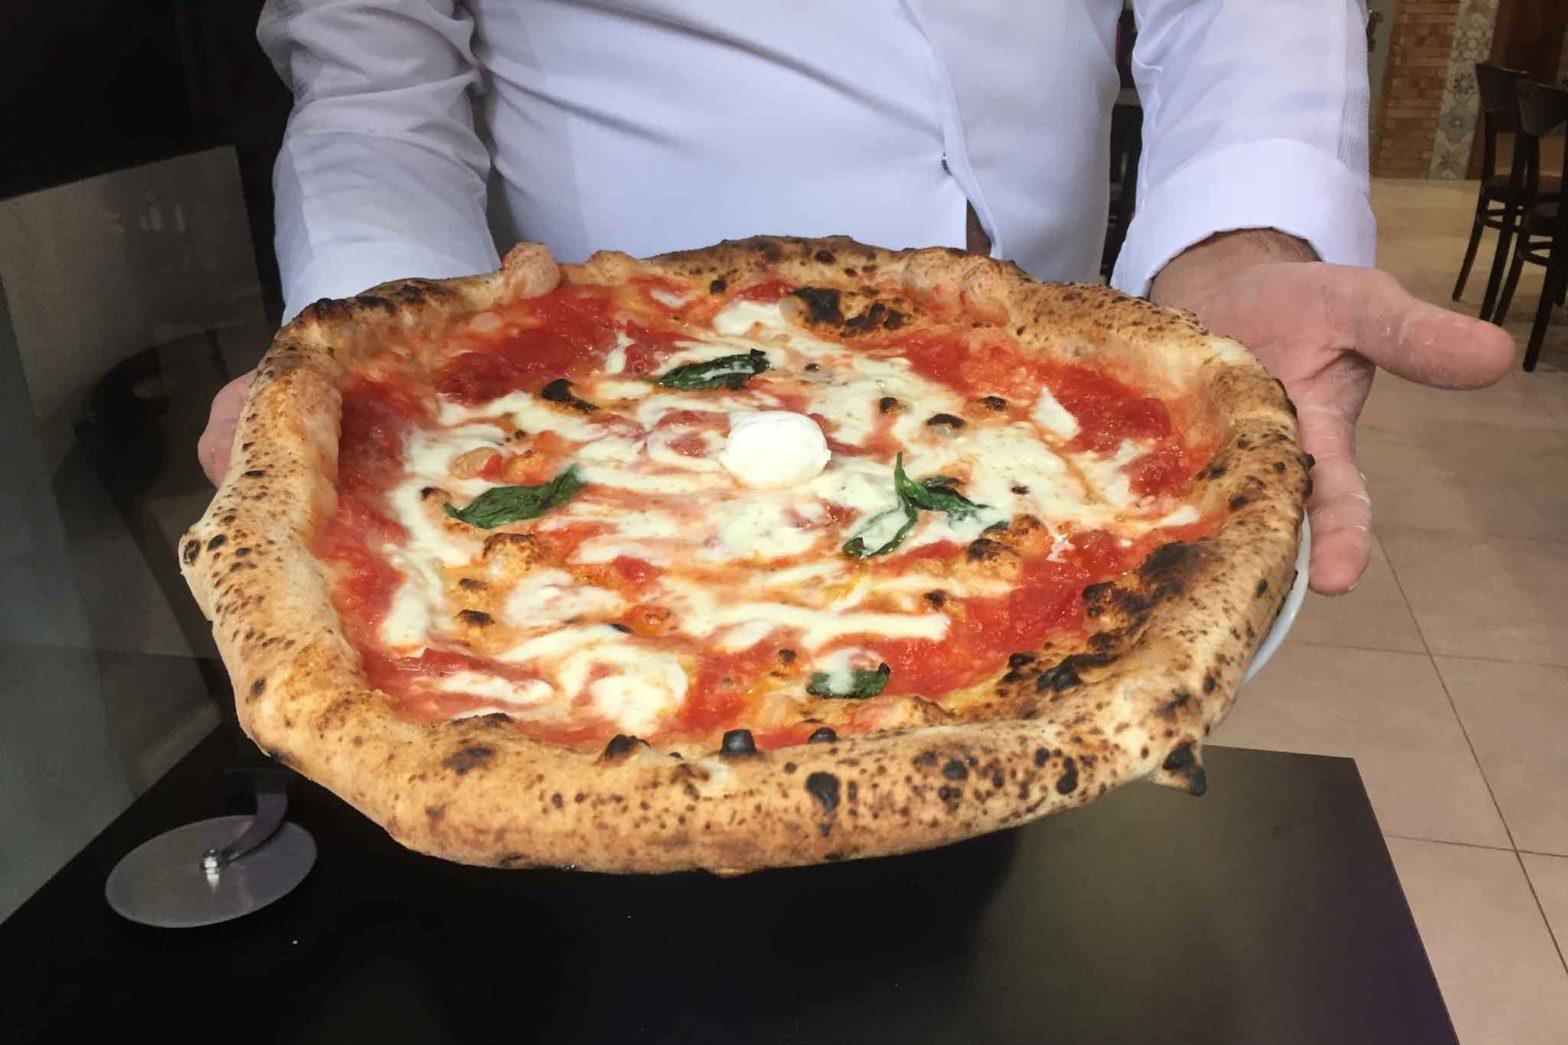 gennaro rapido pizzeria rot carrett pizza margherita